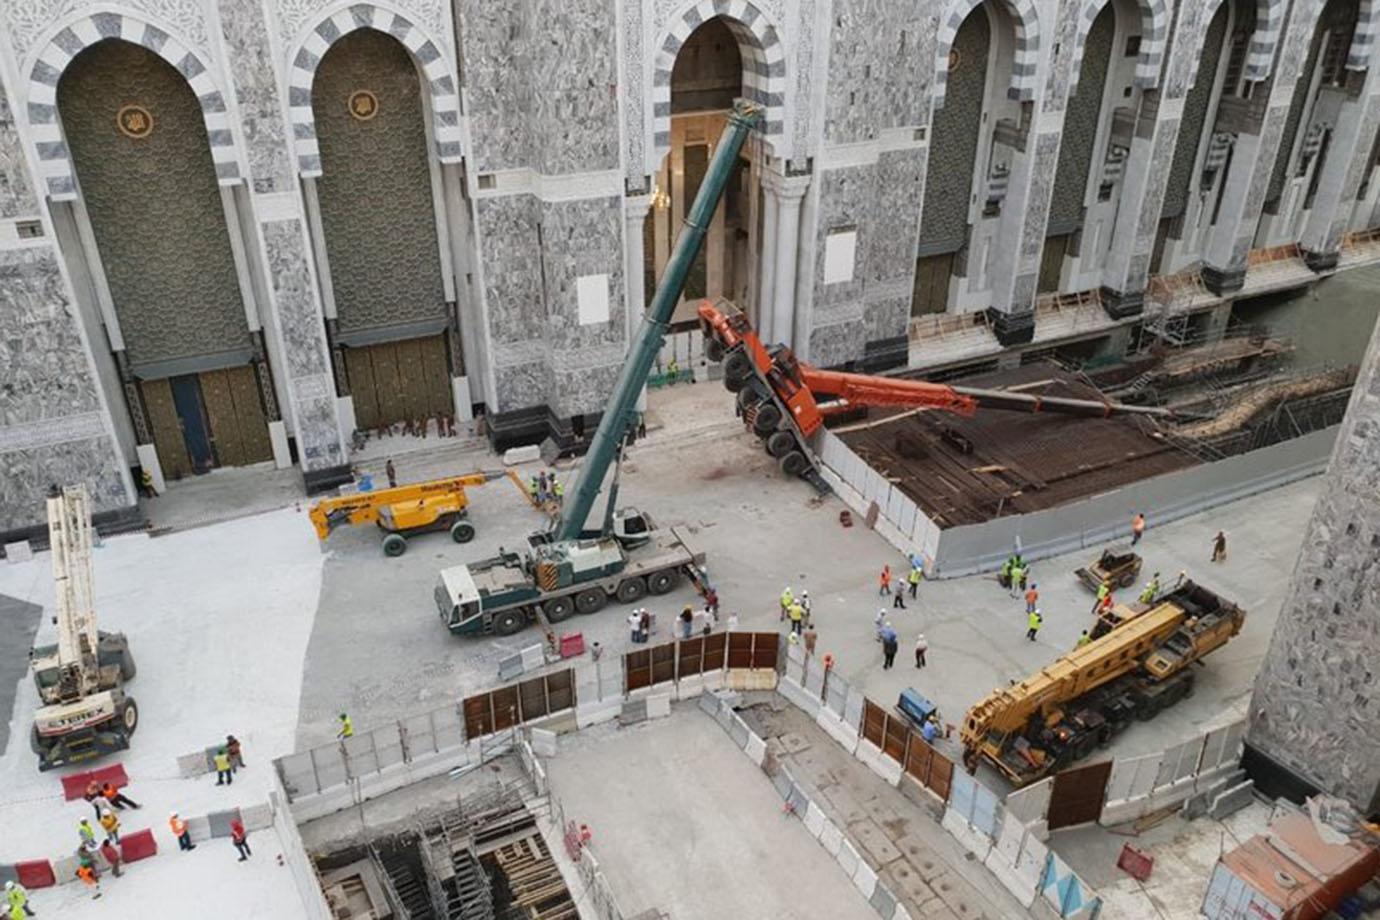 Crane Collapses Near Makkah Grand Mosque